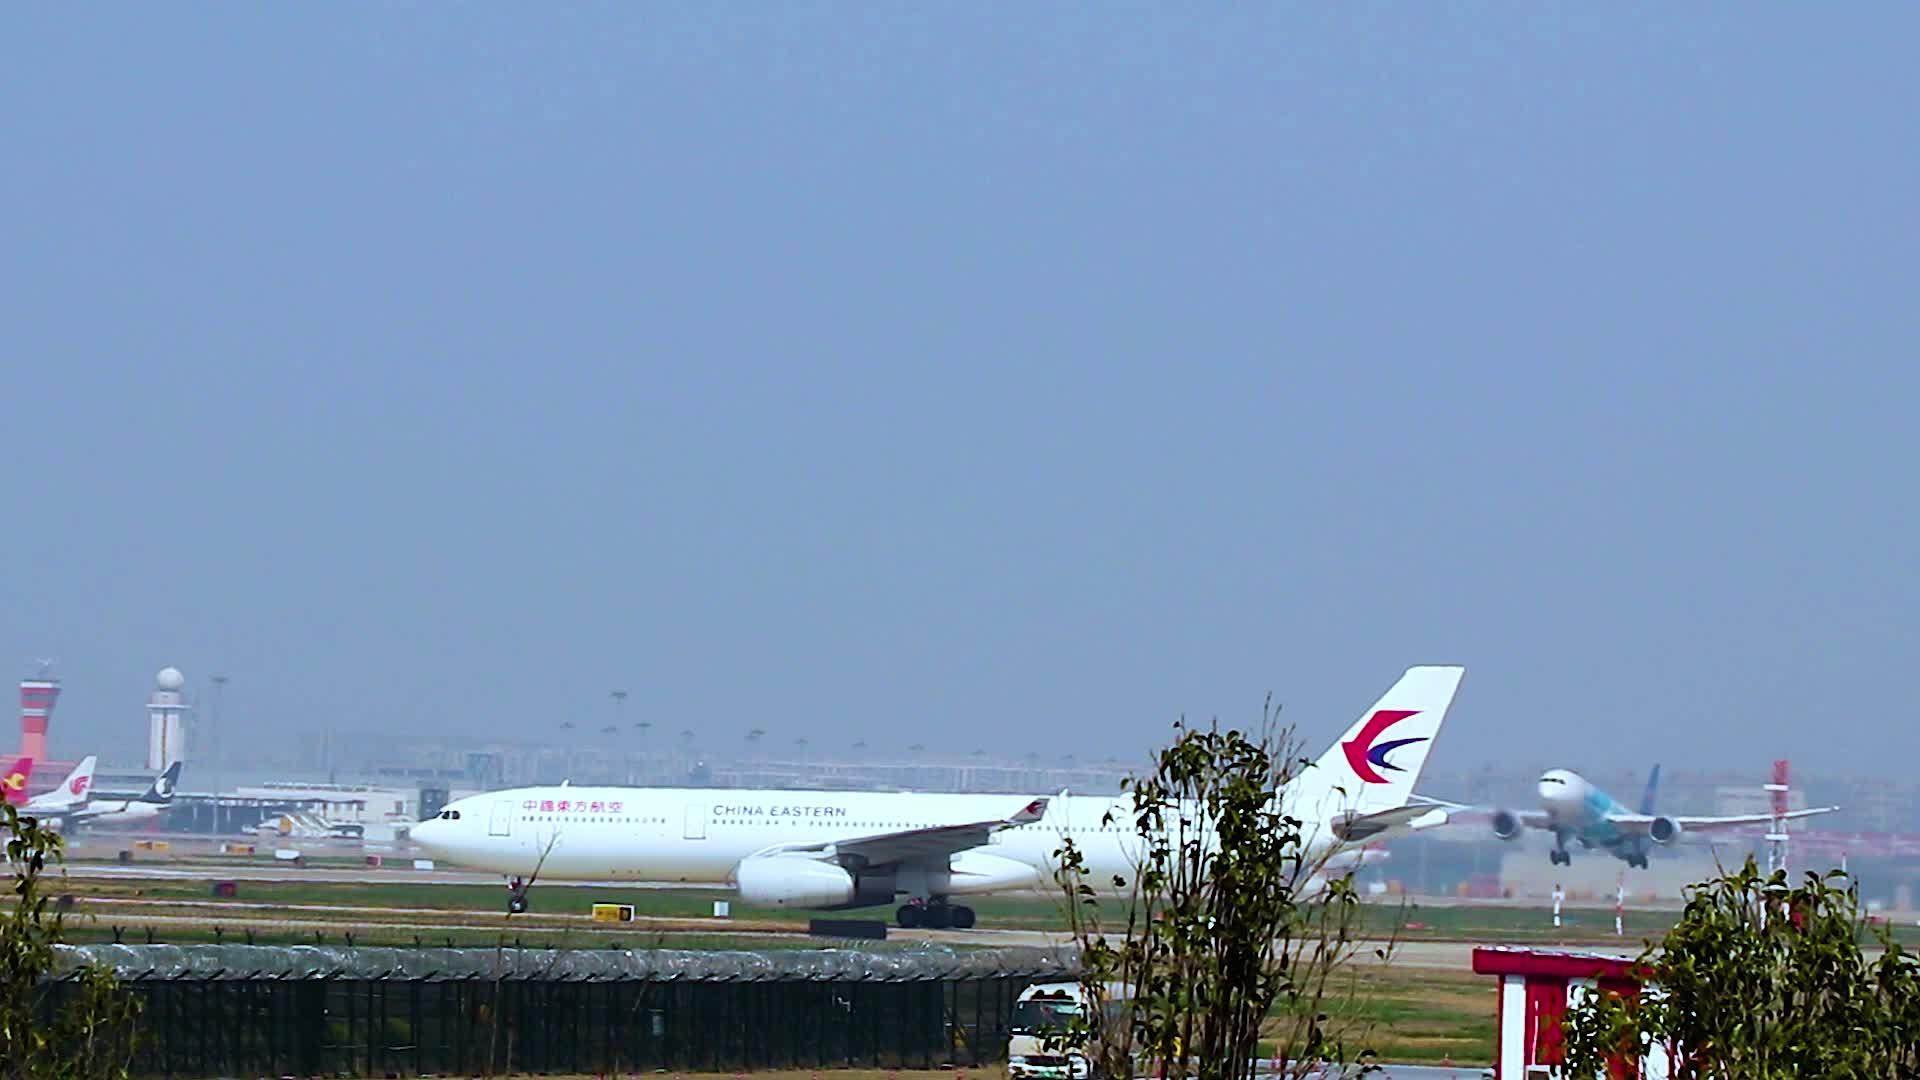 Air 물류 배송 서비스화물 회사의 율 전달자 transport company 에 두바이 UAE 쿠웨이트 사우디 아라비아